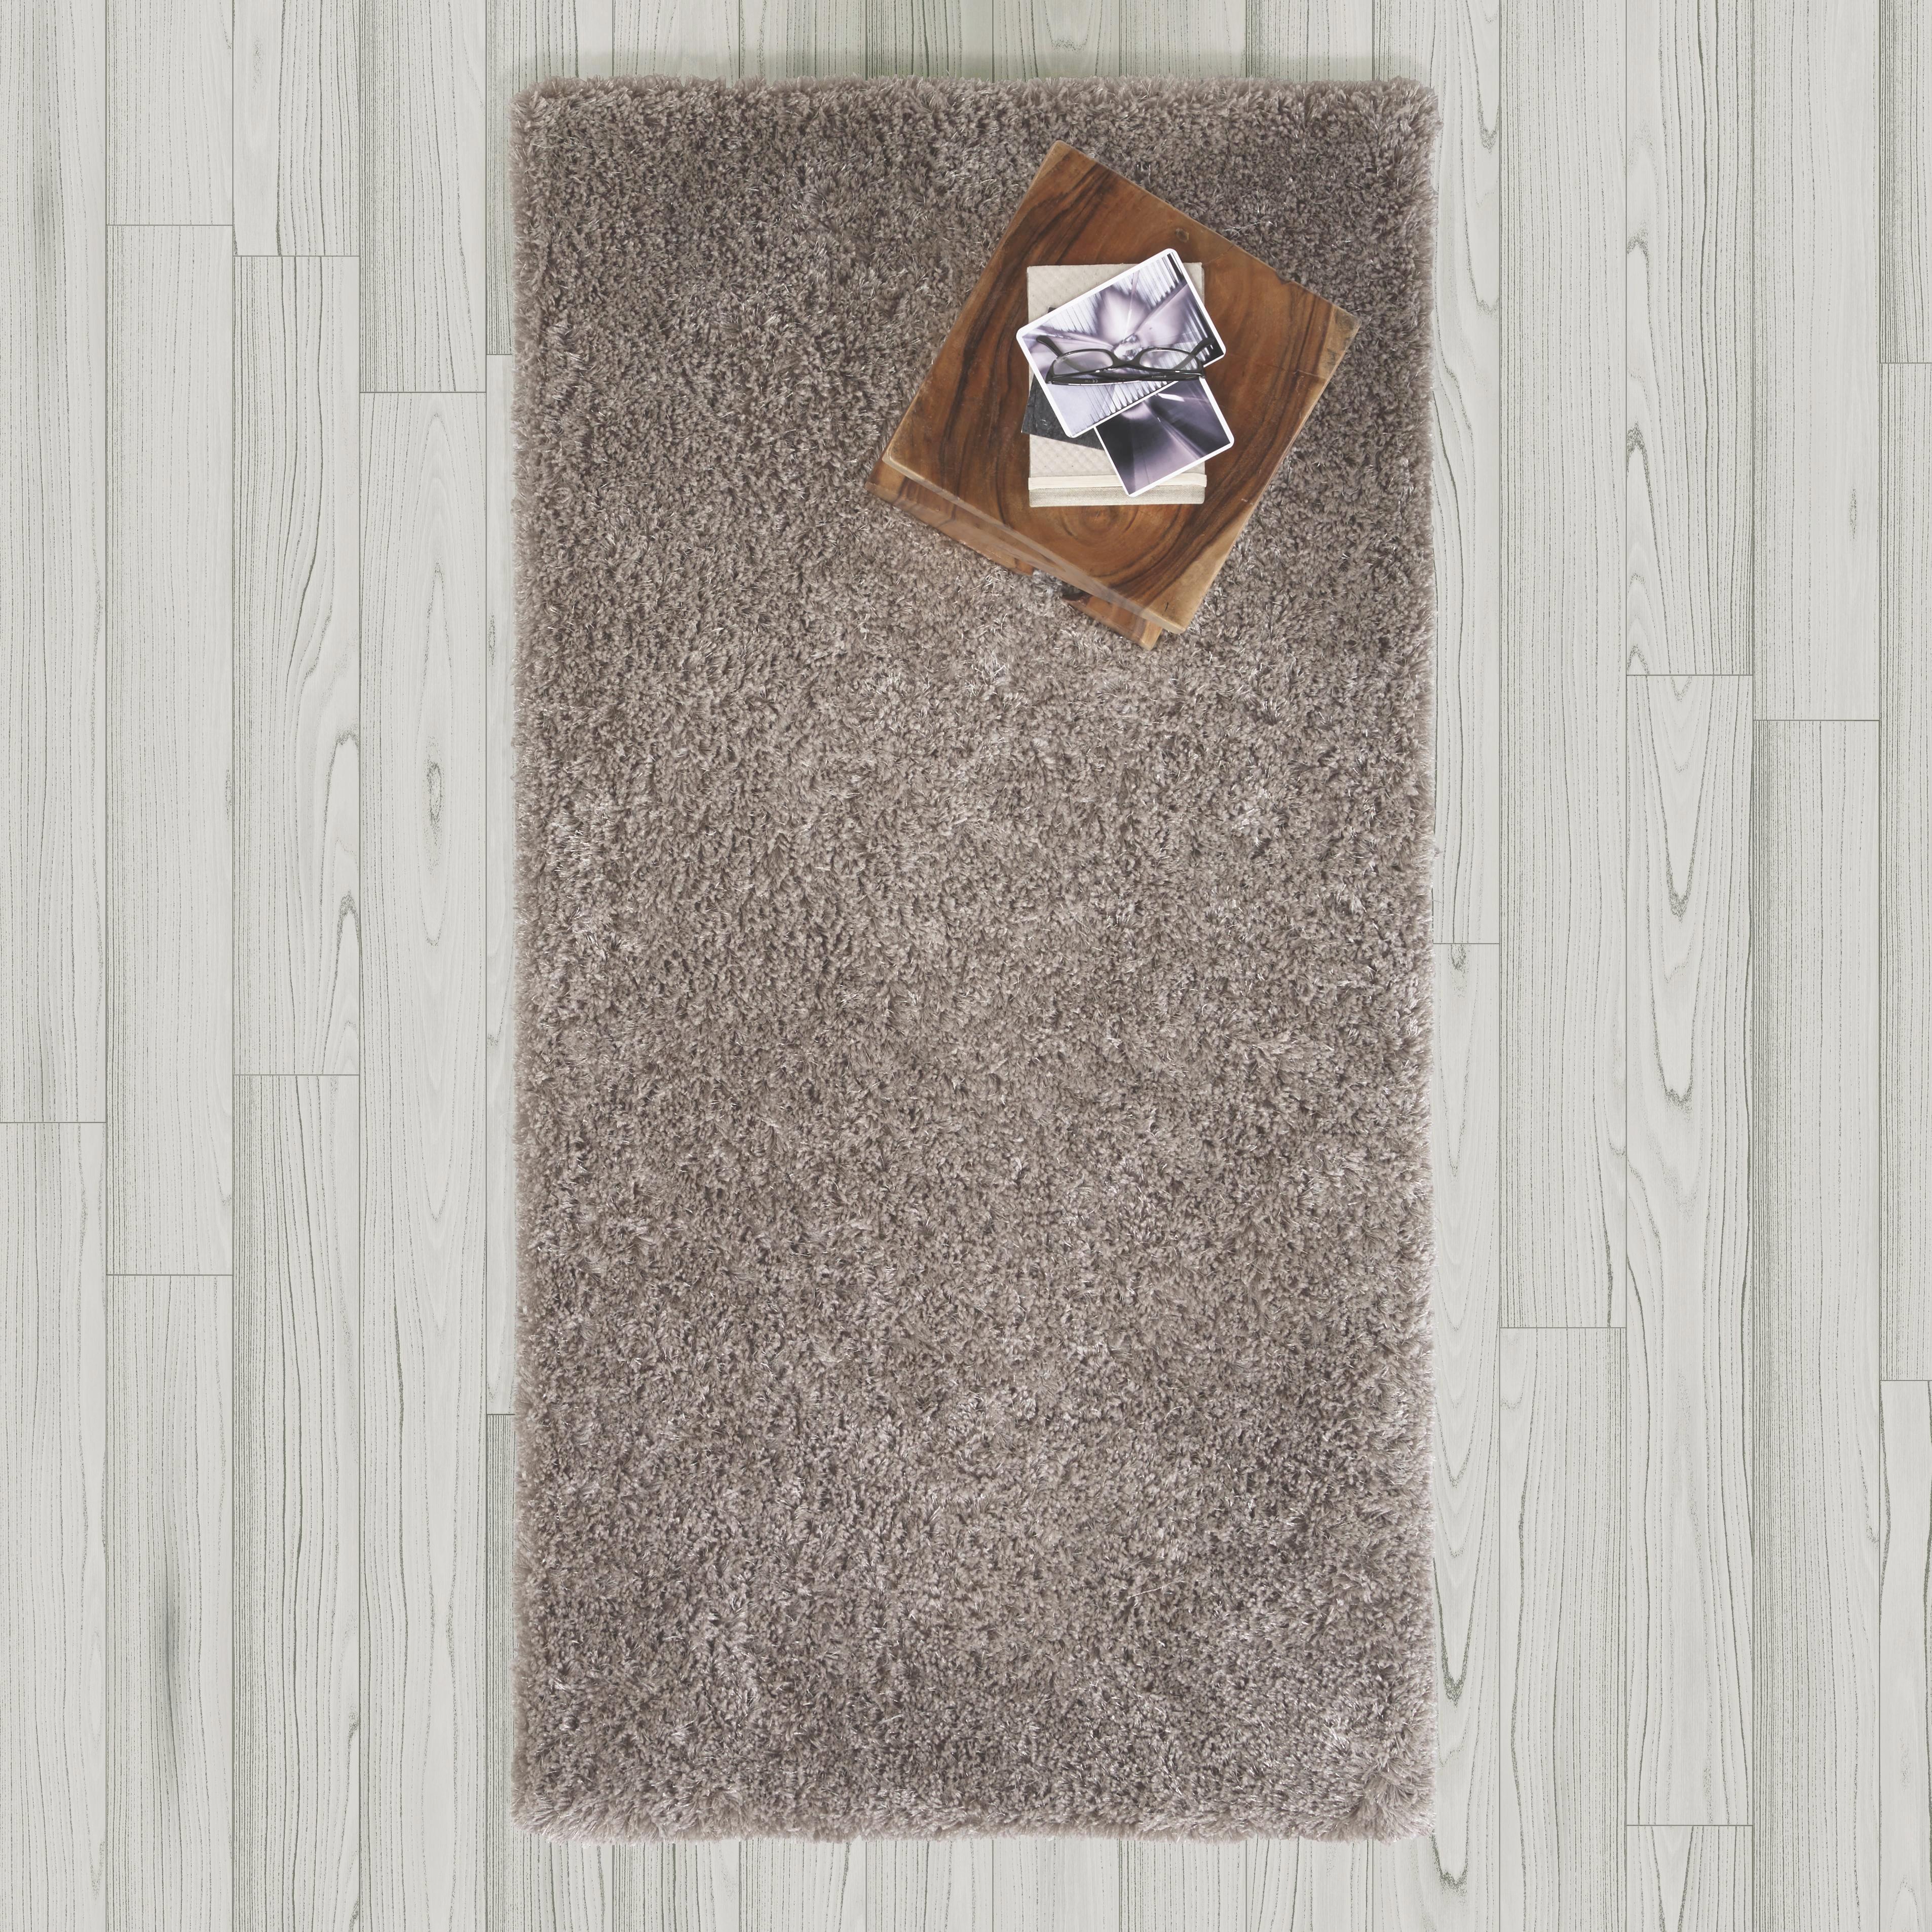 Hochflorteppich Shaggy 80x150cm - Grau, MODERN, Textil (80/150cm) - MÖMAX modern living